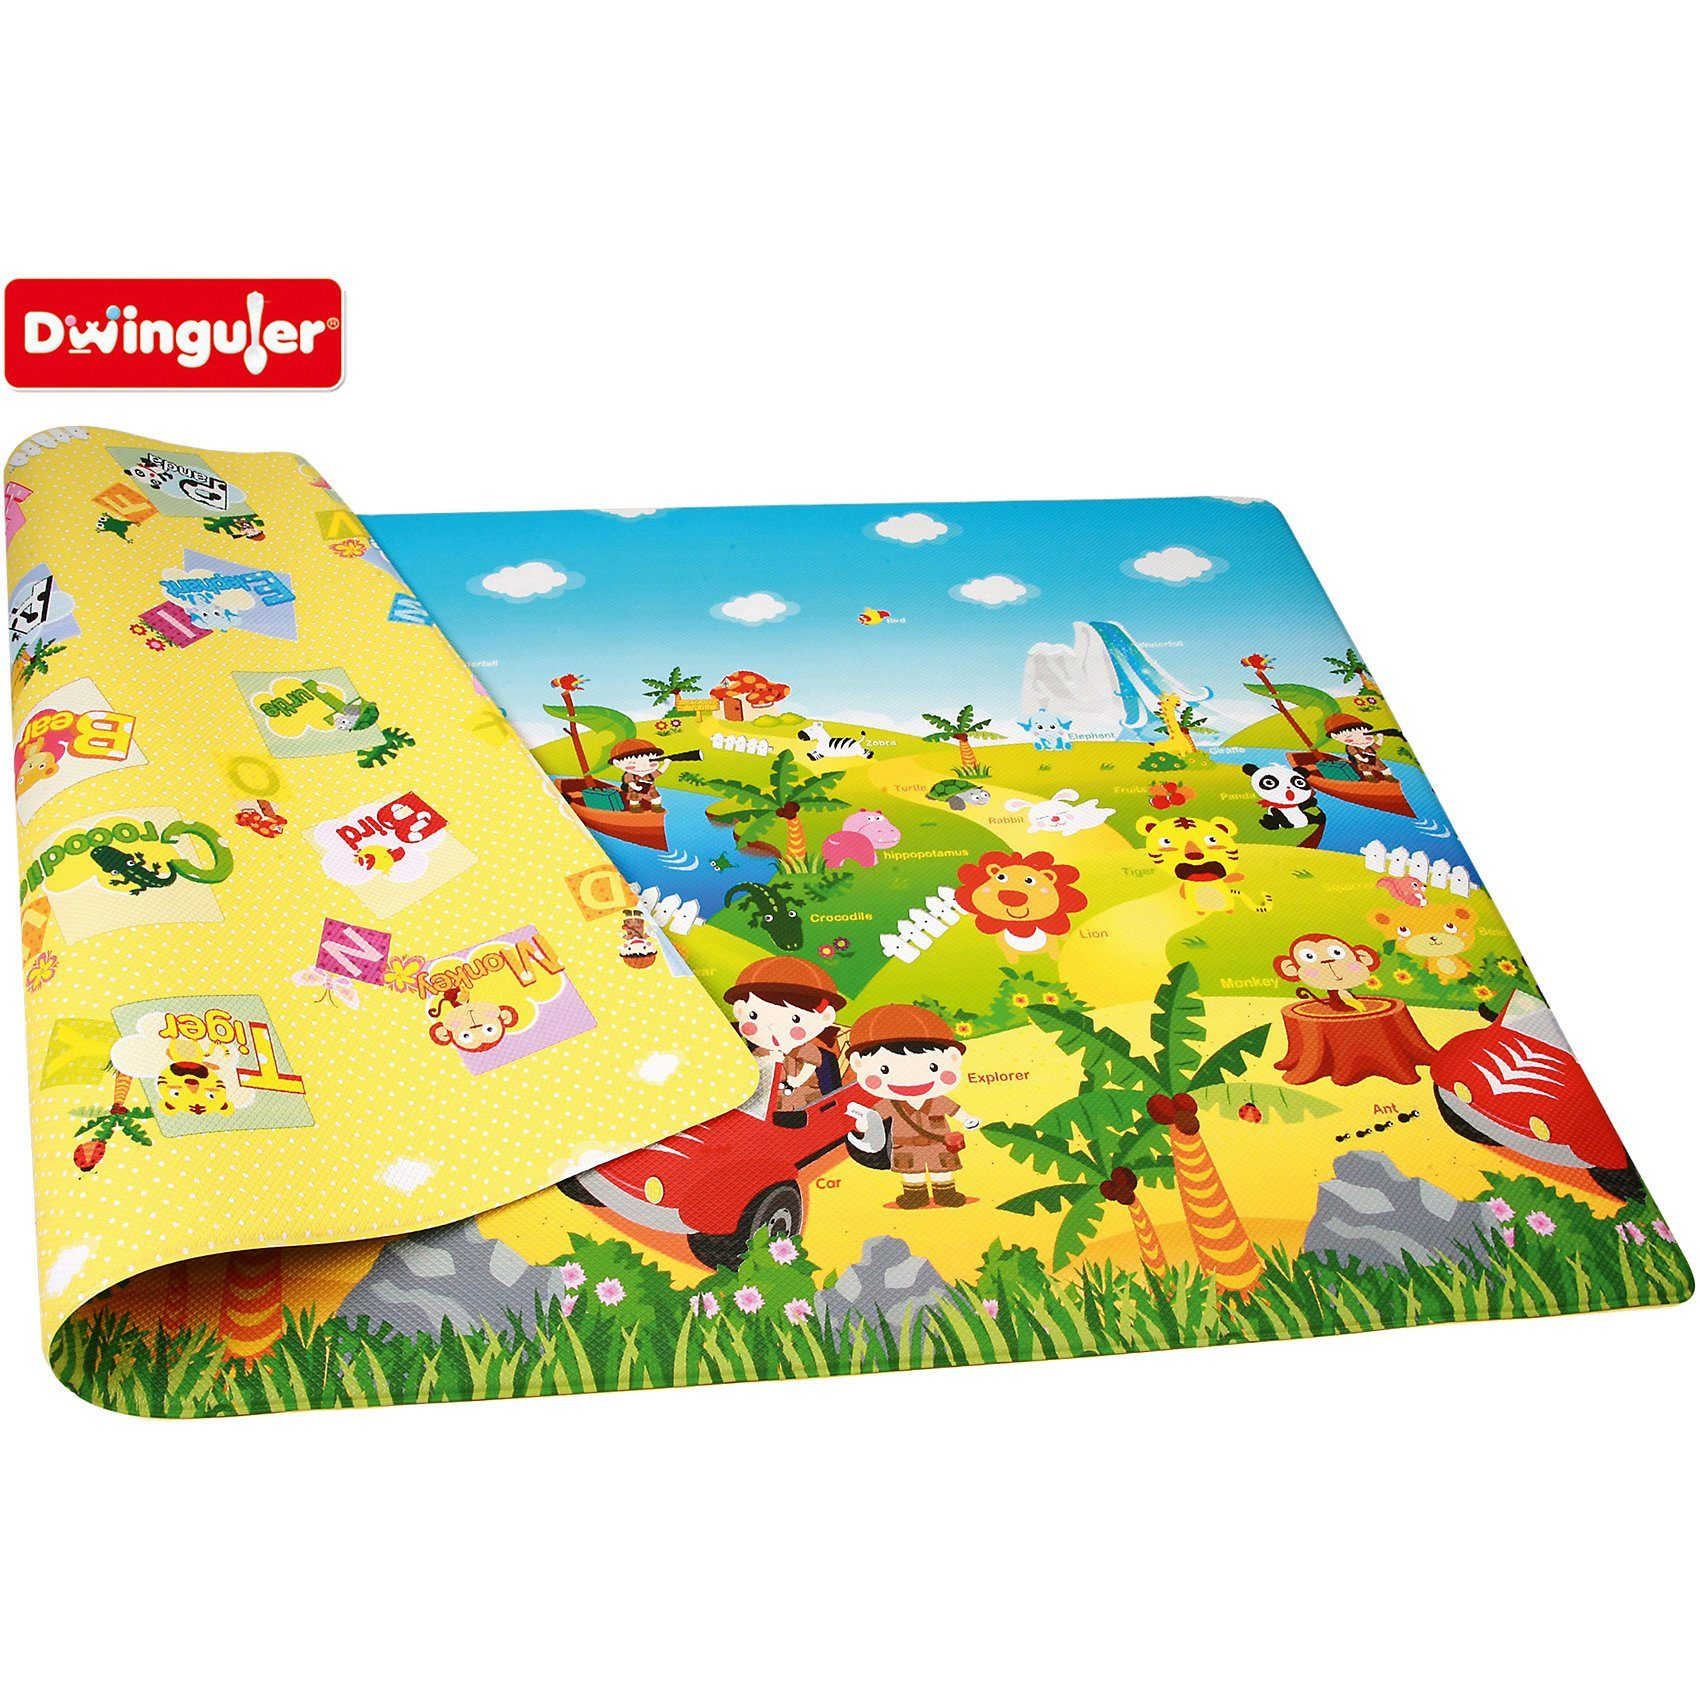 Dwinguler Spielmatte Safari, 140 x 230 cm